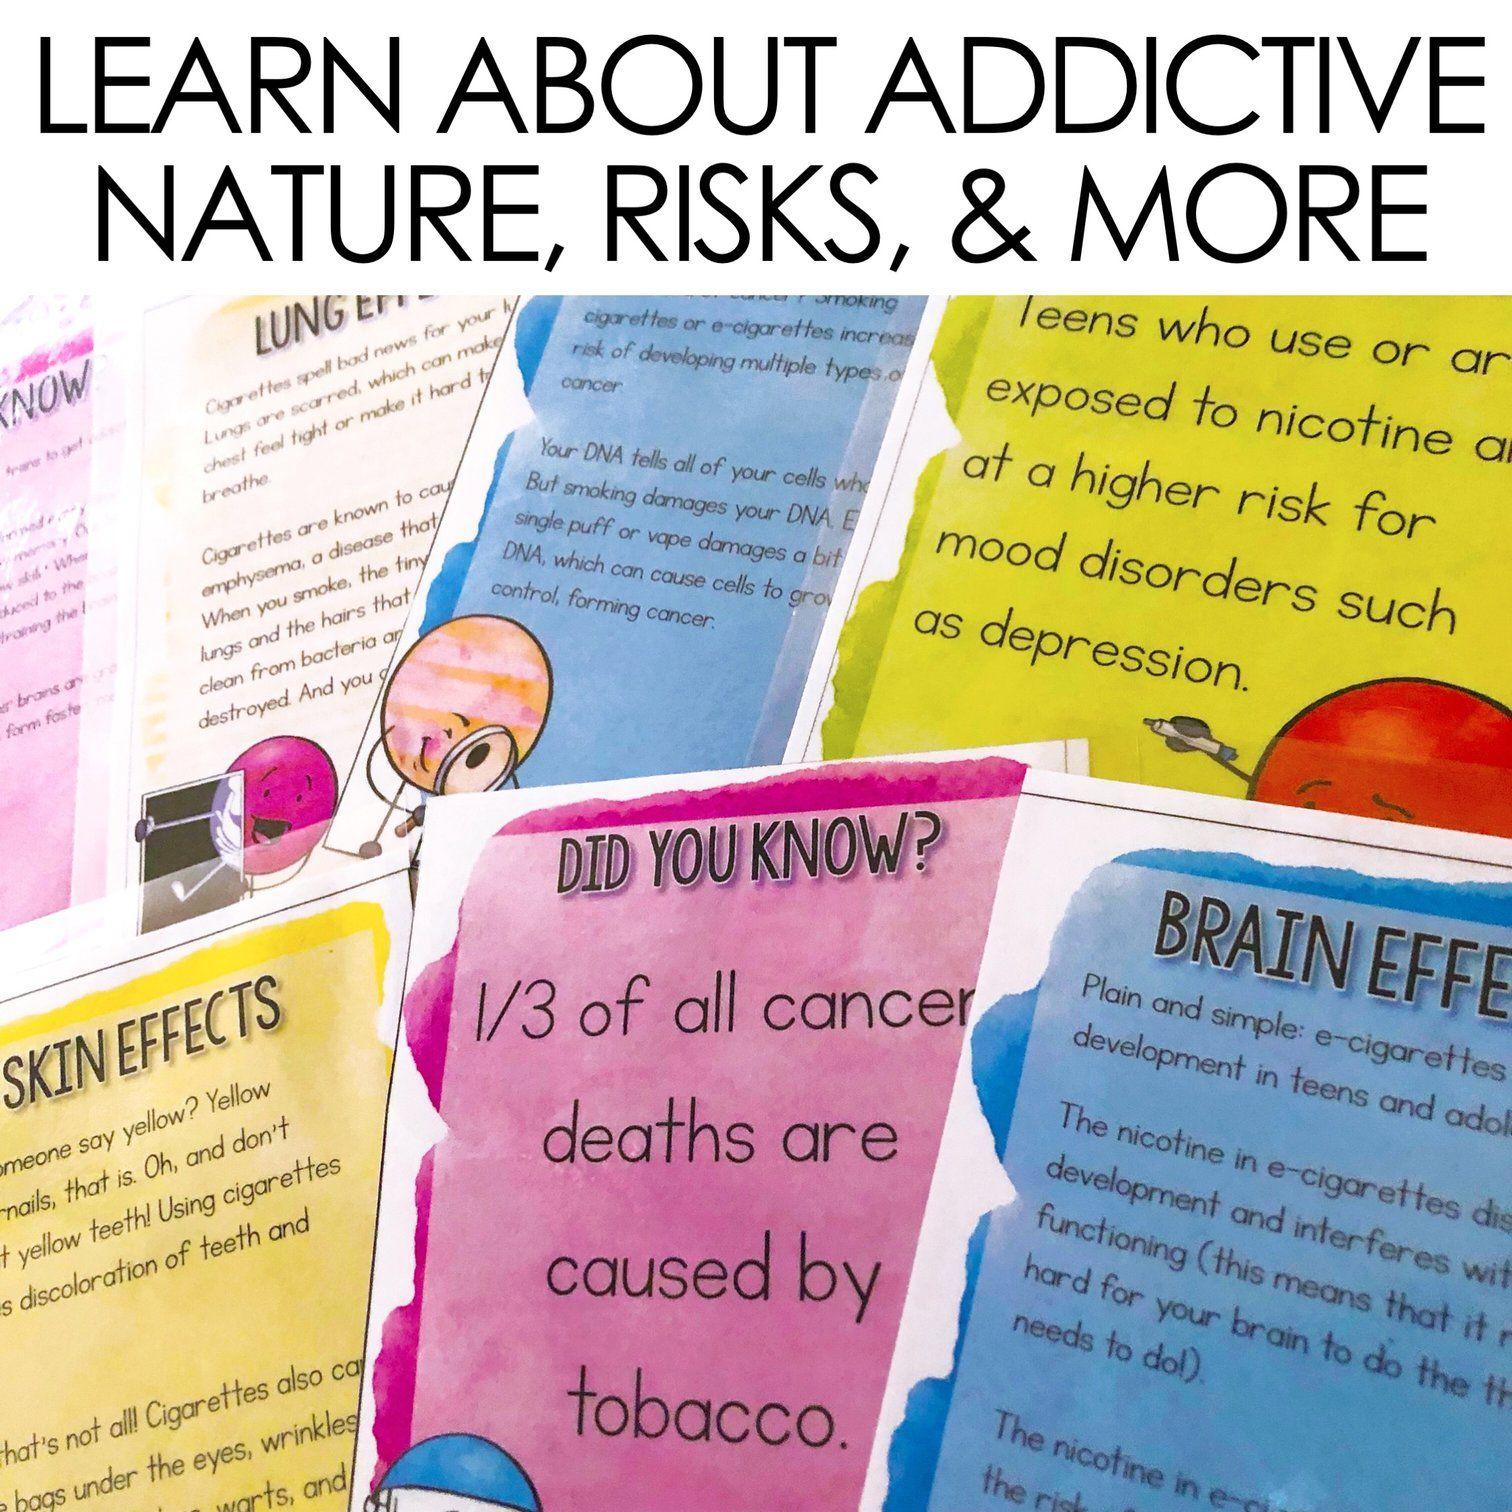 Vaping Cigarettes And E Cigarettes Classroom Guidance